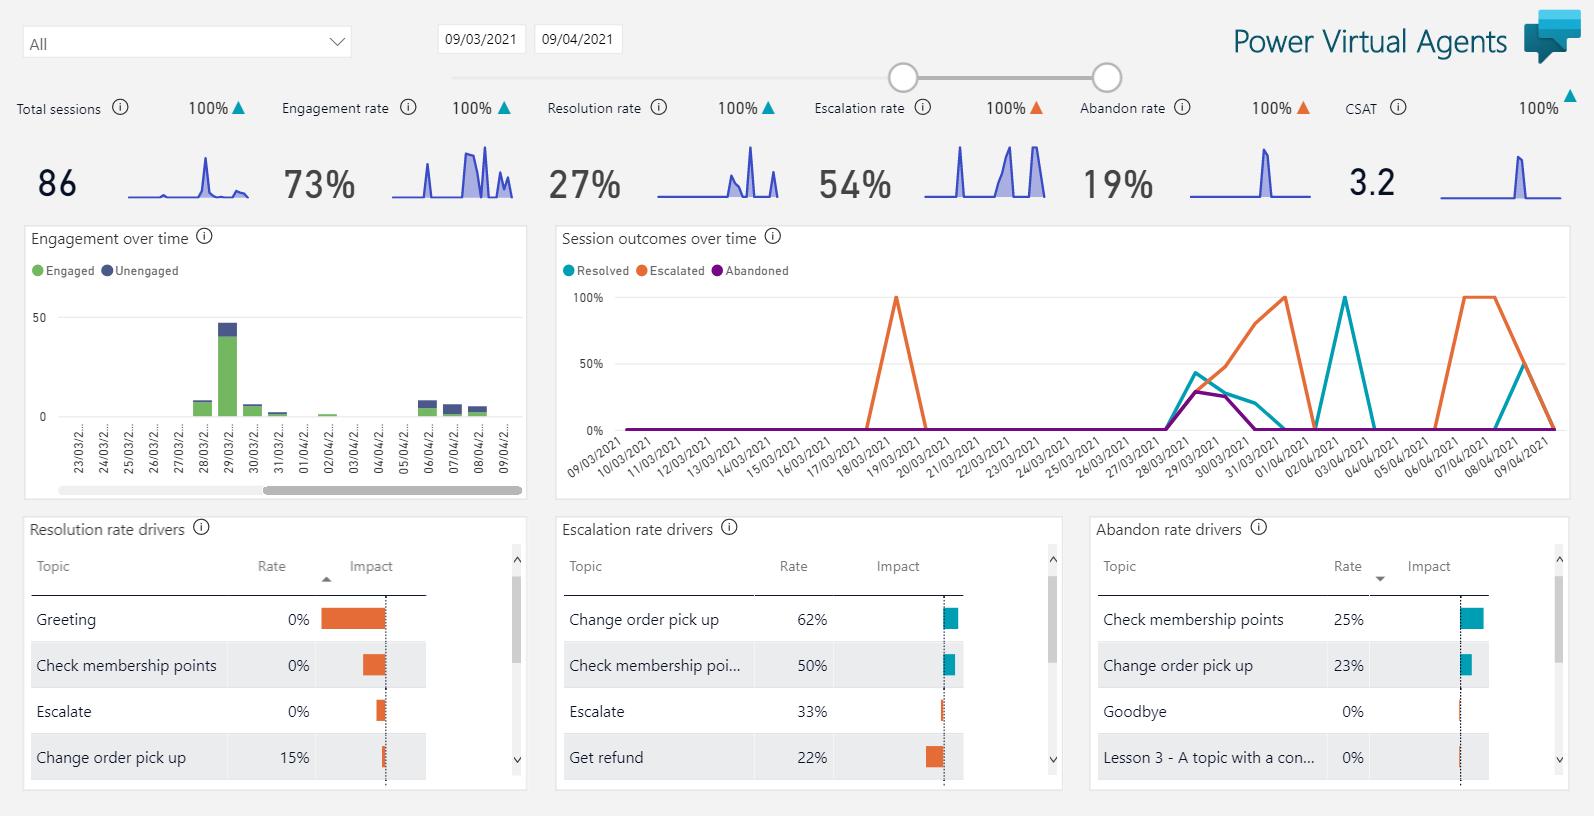 Custom Analytics solution for Power Virtual Agents